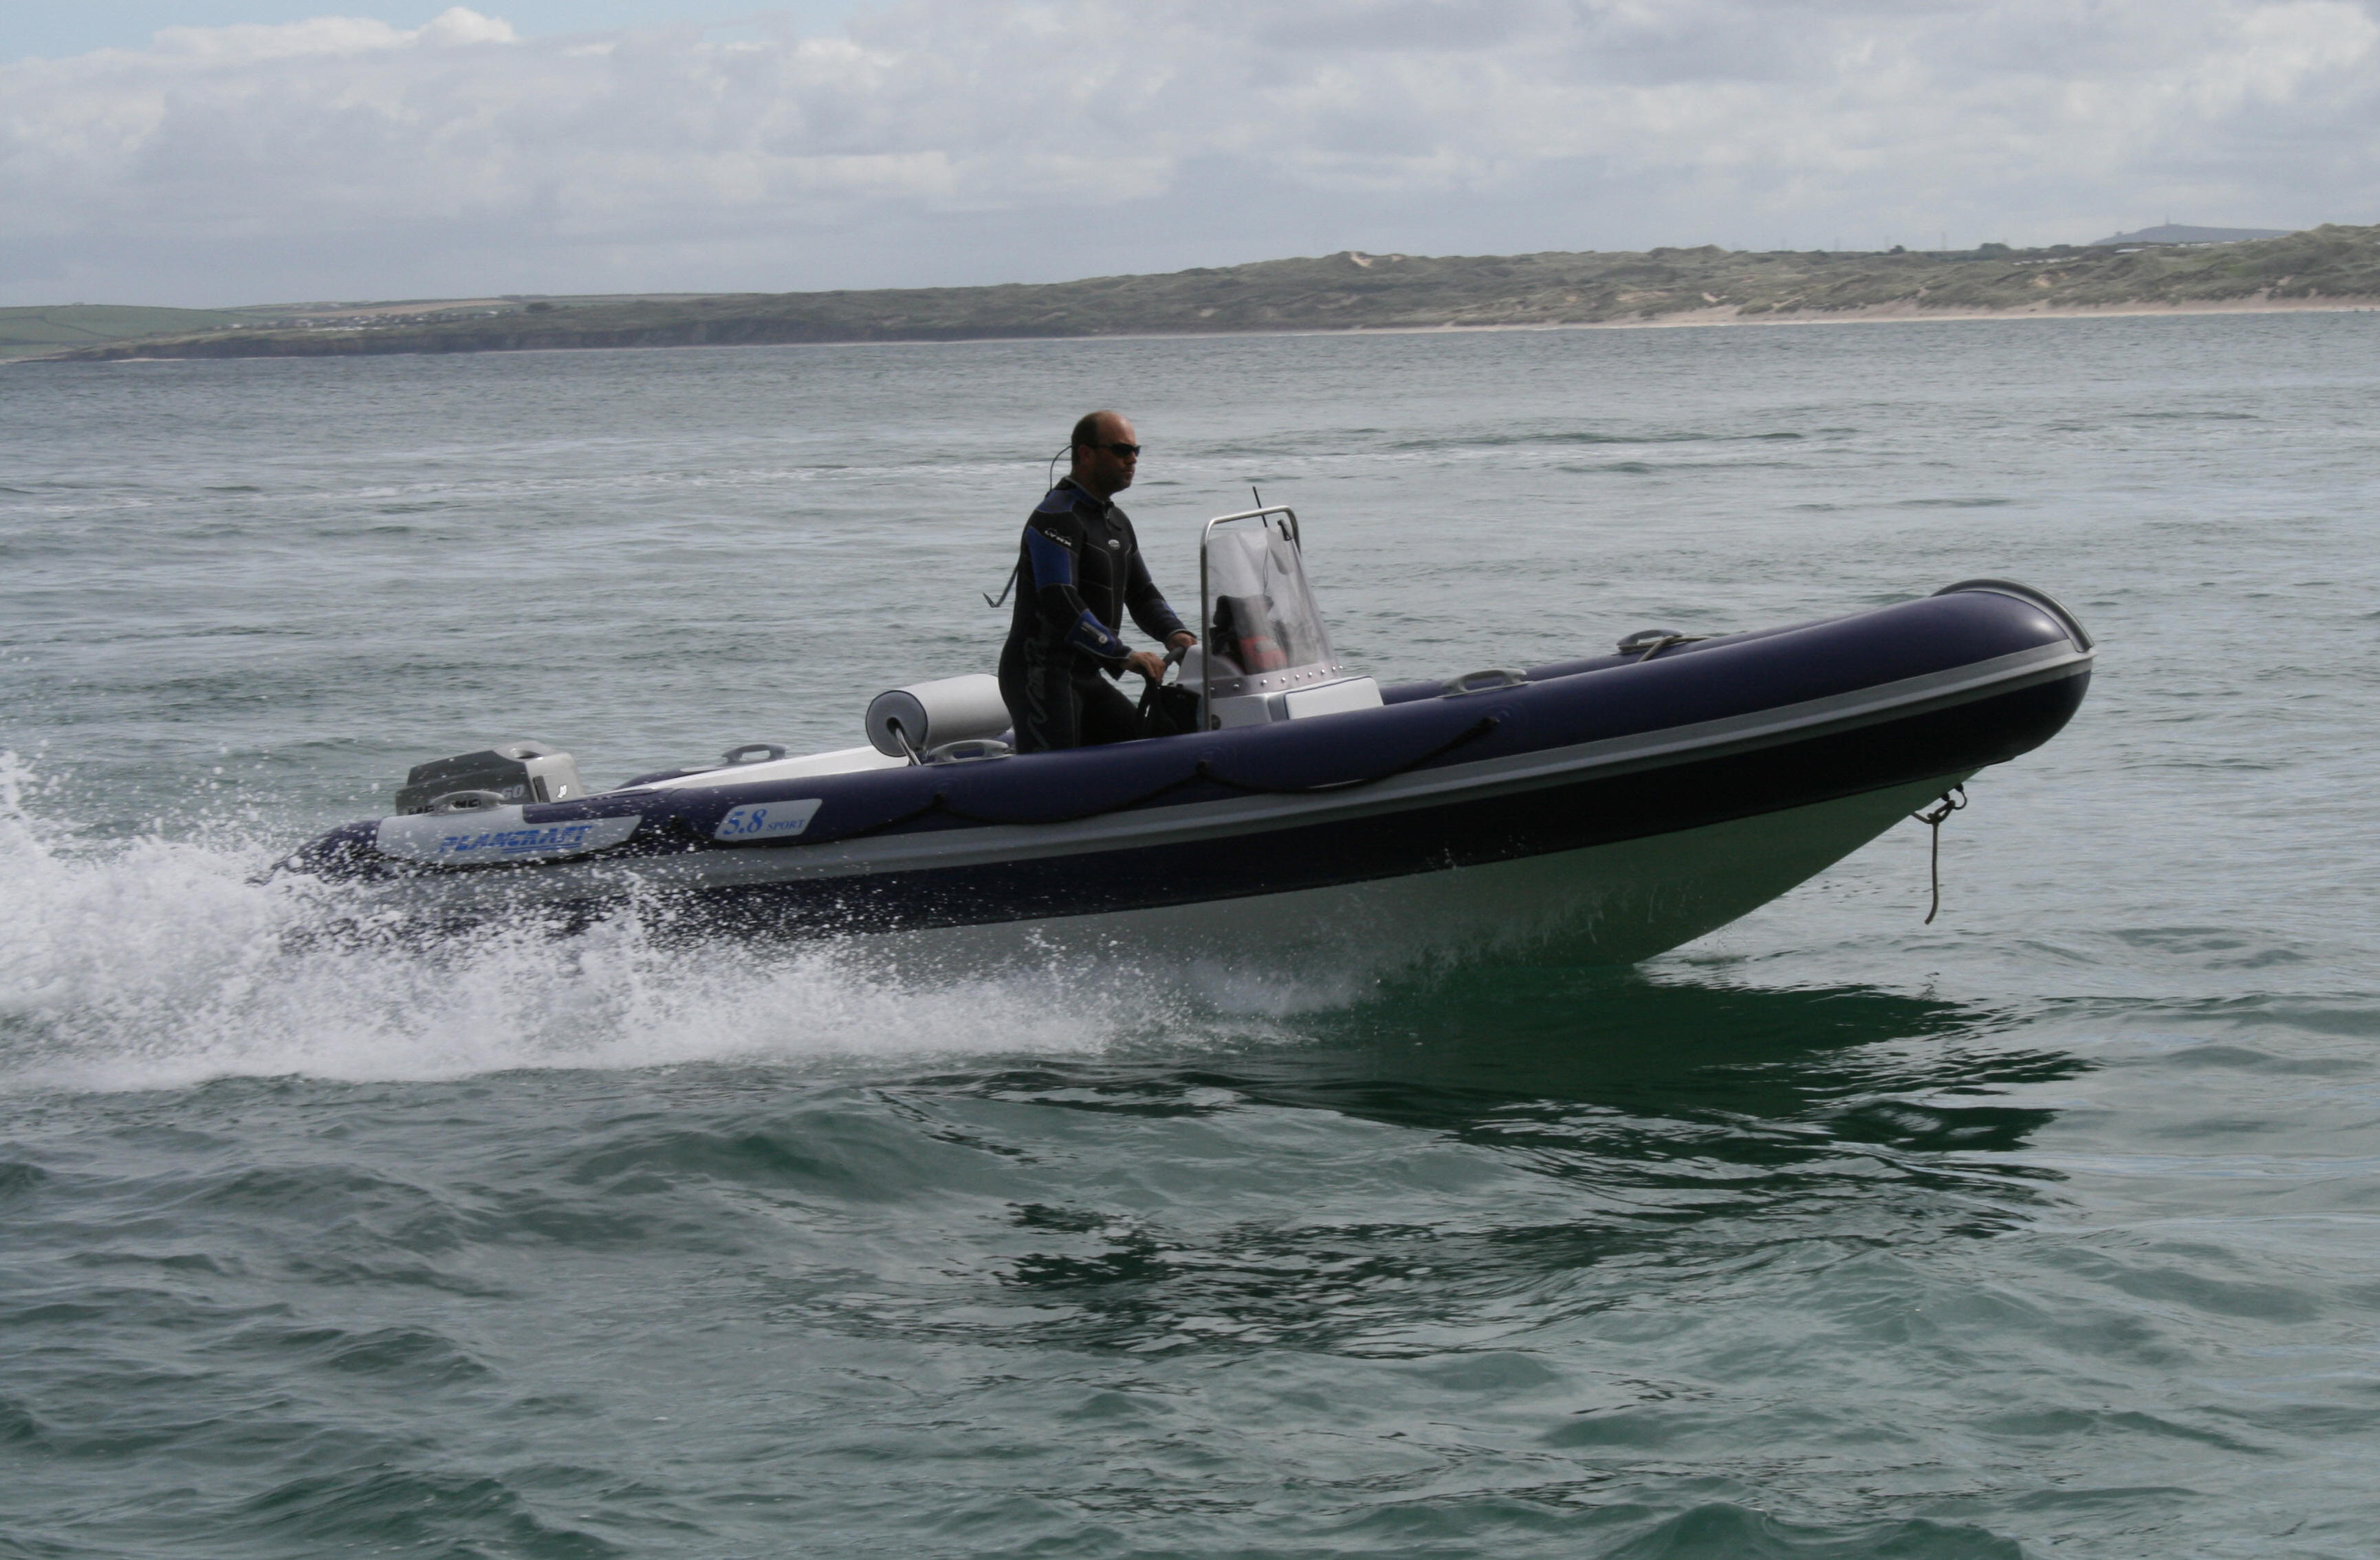 Plancraft luxury rib 5 8 metre luxury sports rib for Plan craft